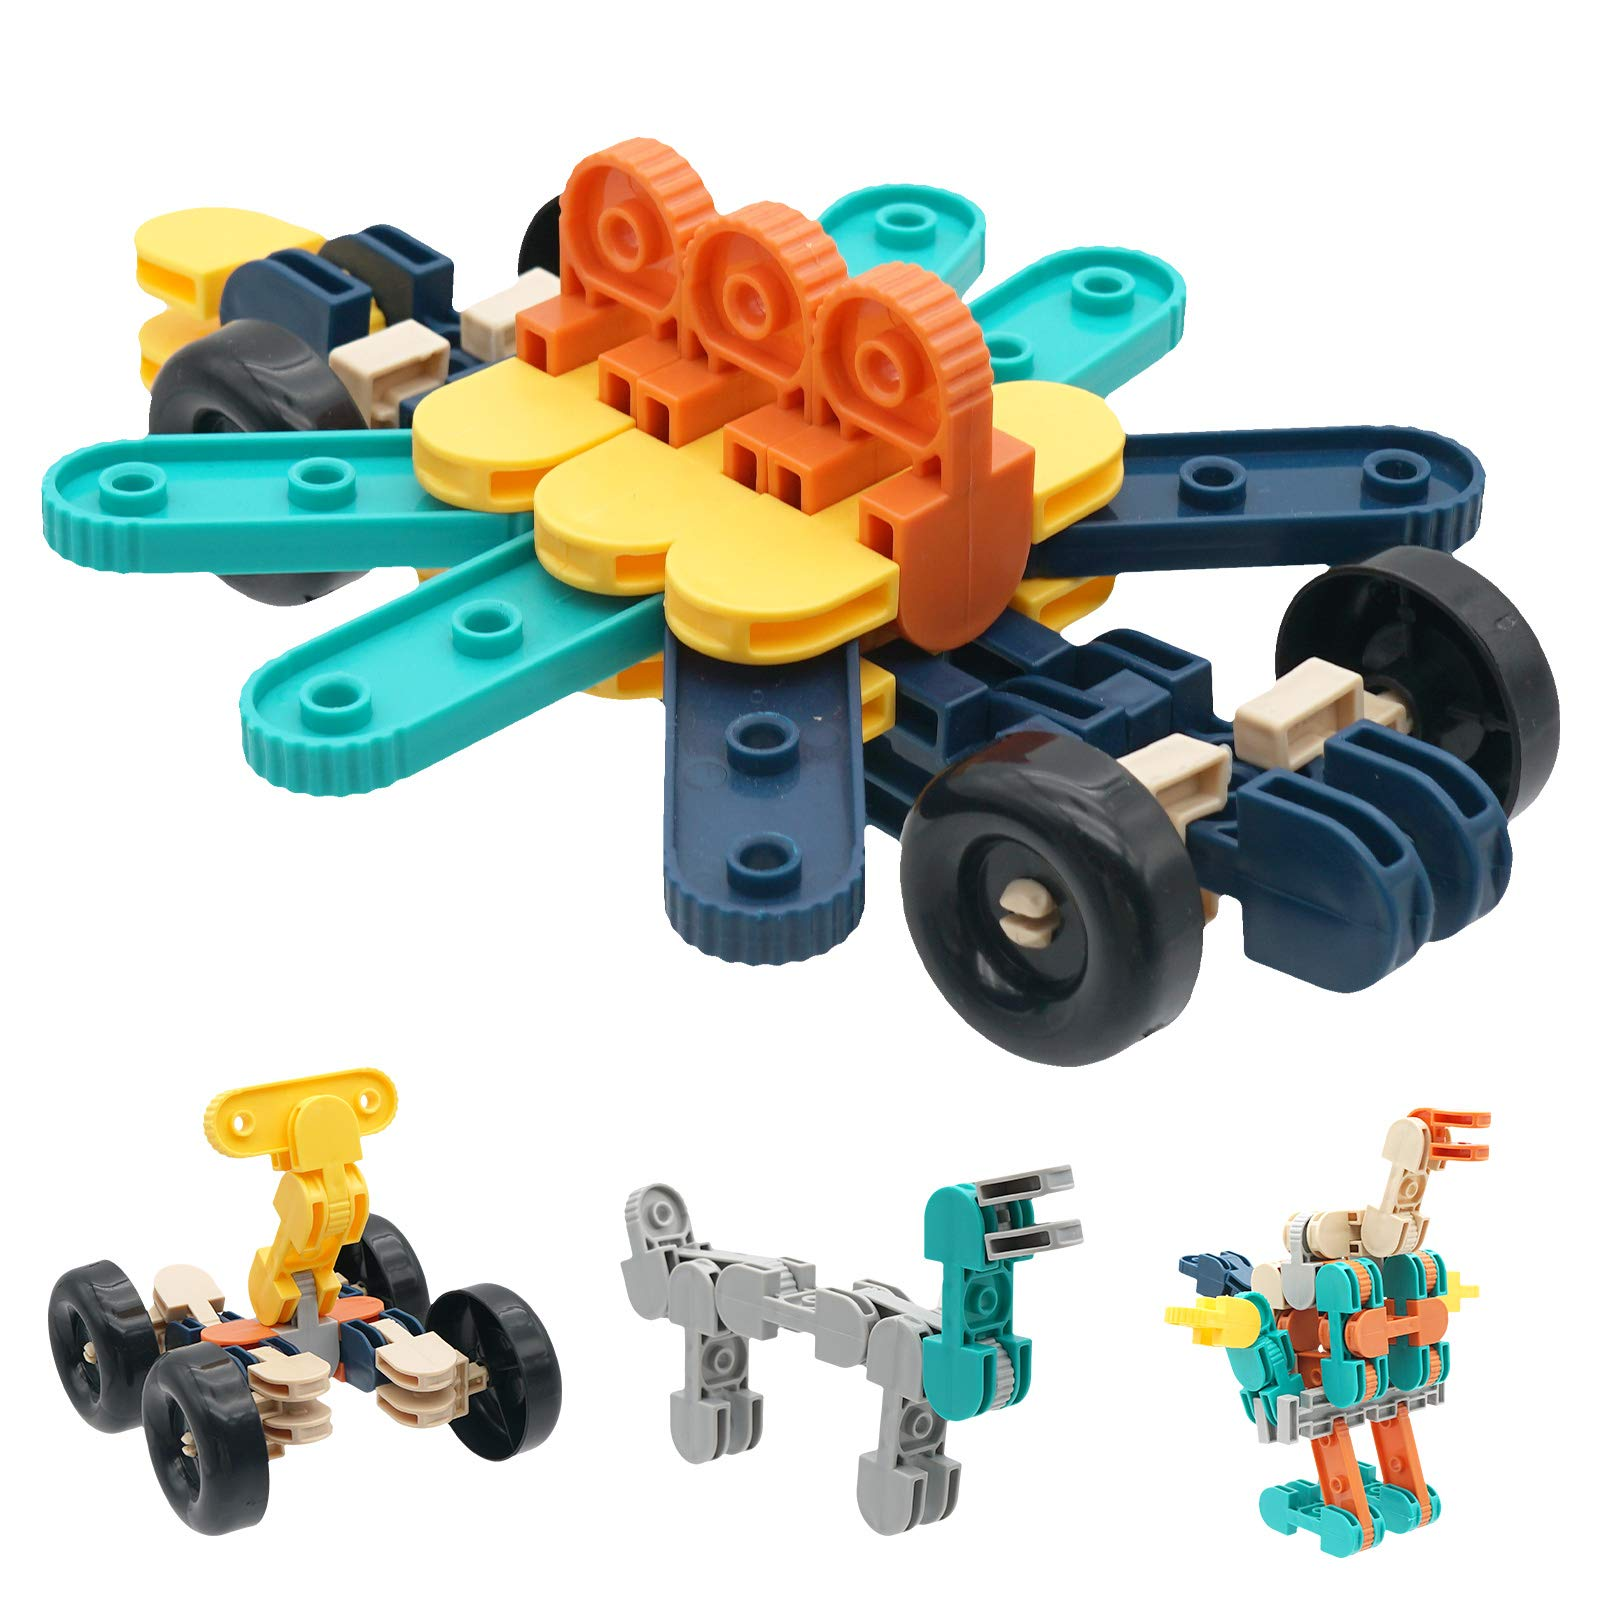 KANKOJO Blocks Kit Take Apart Set STEM Learning Building Toys Games for